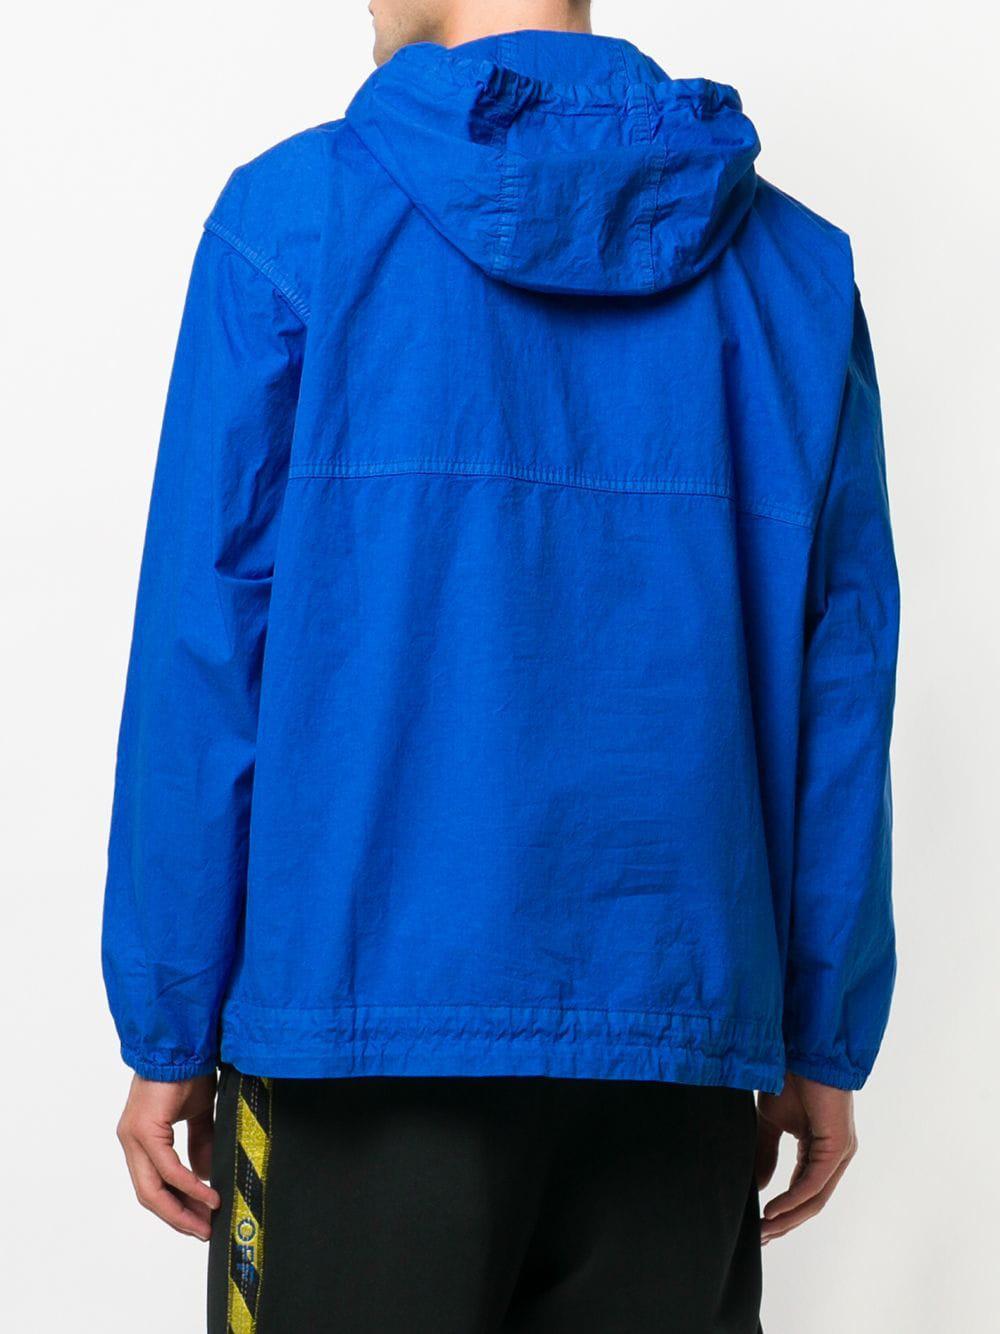 6089ed7b6 Lyst - Off-White c o Virgil Abloh Press Stud Hoodie in Blue for Men